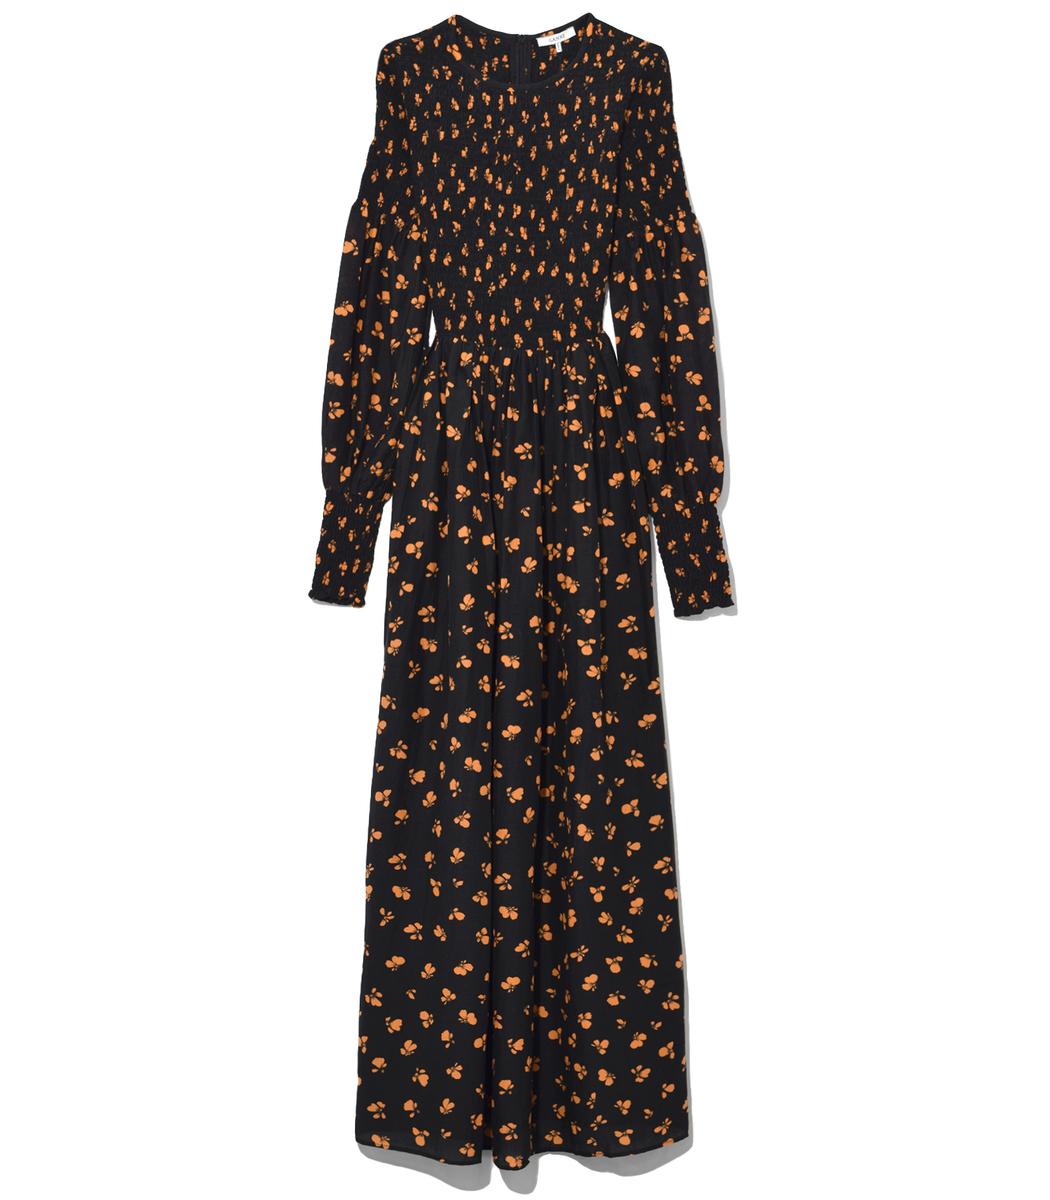 92248d83 Ganni Beacon Printed Smocked Maxi Dress In Black | ModeSens